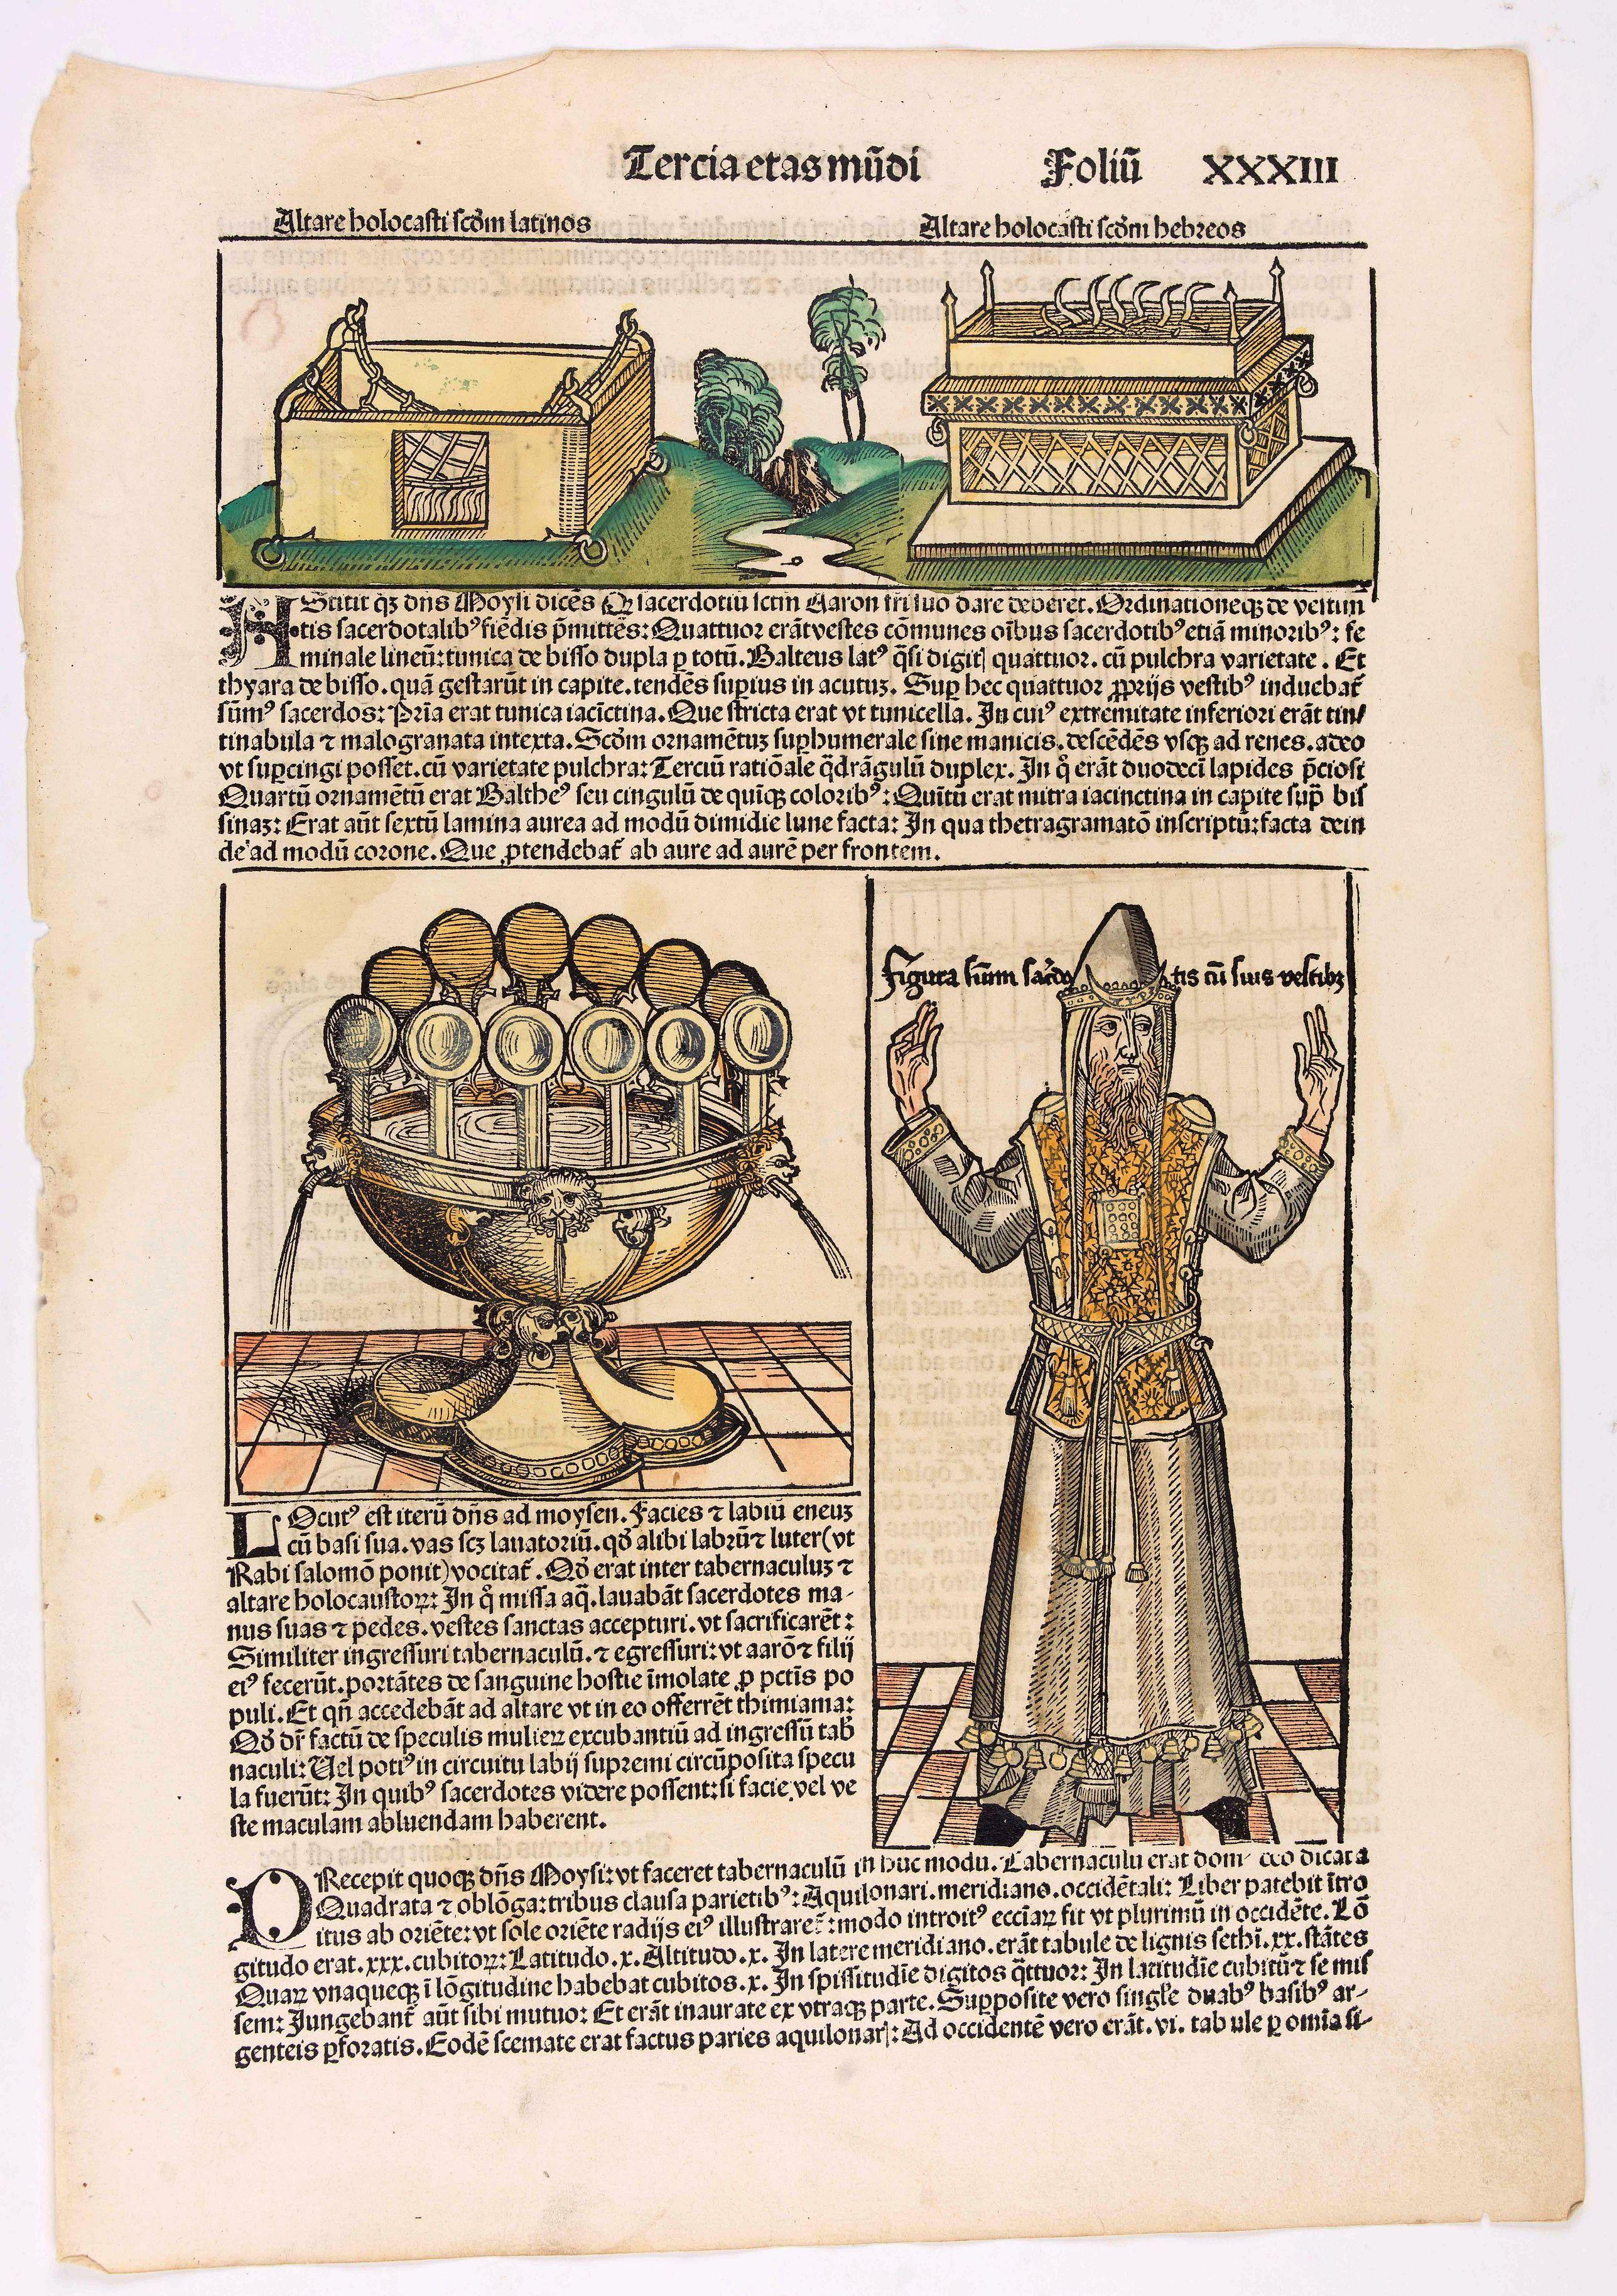 SCHEDEL, H. -  Quita Etas Mundi. Folium. XXXIII